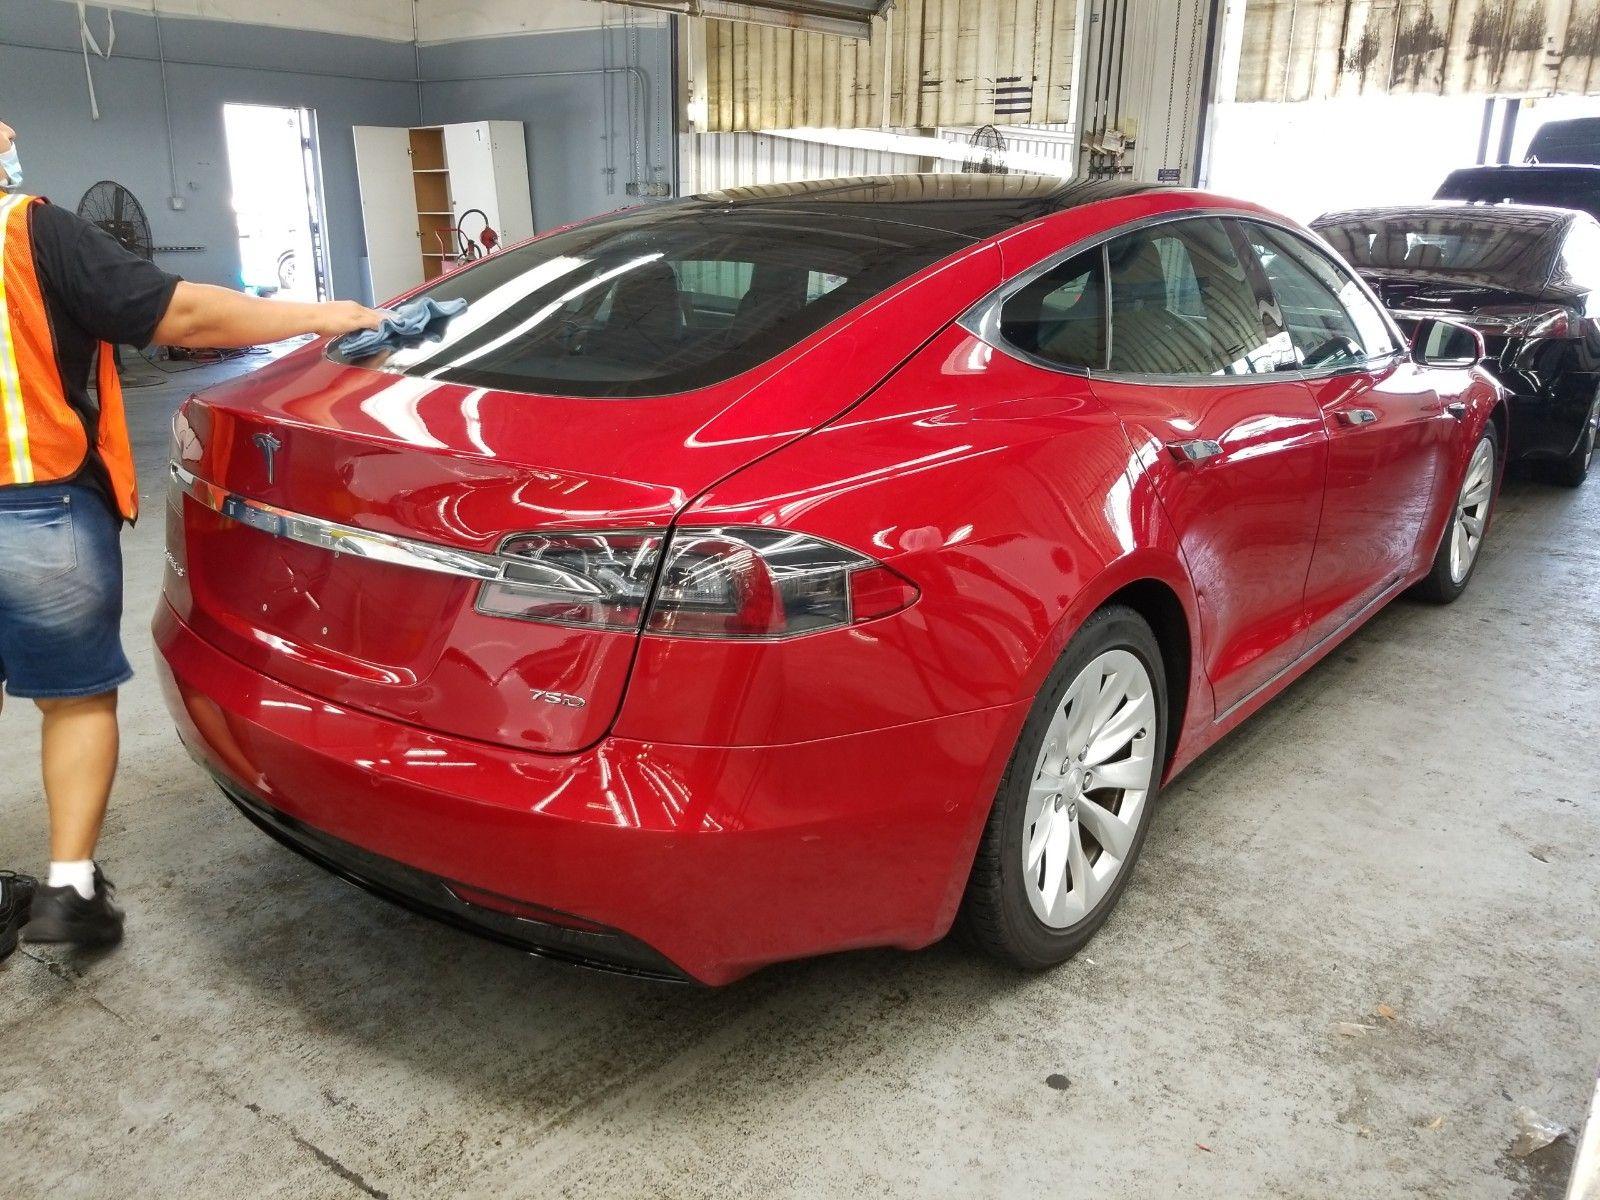 2018 Tesla Model s . Lot 99913850101 Vin 5YJSA1E20JF281189